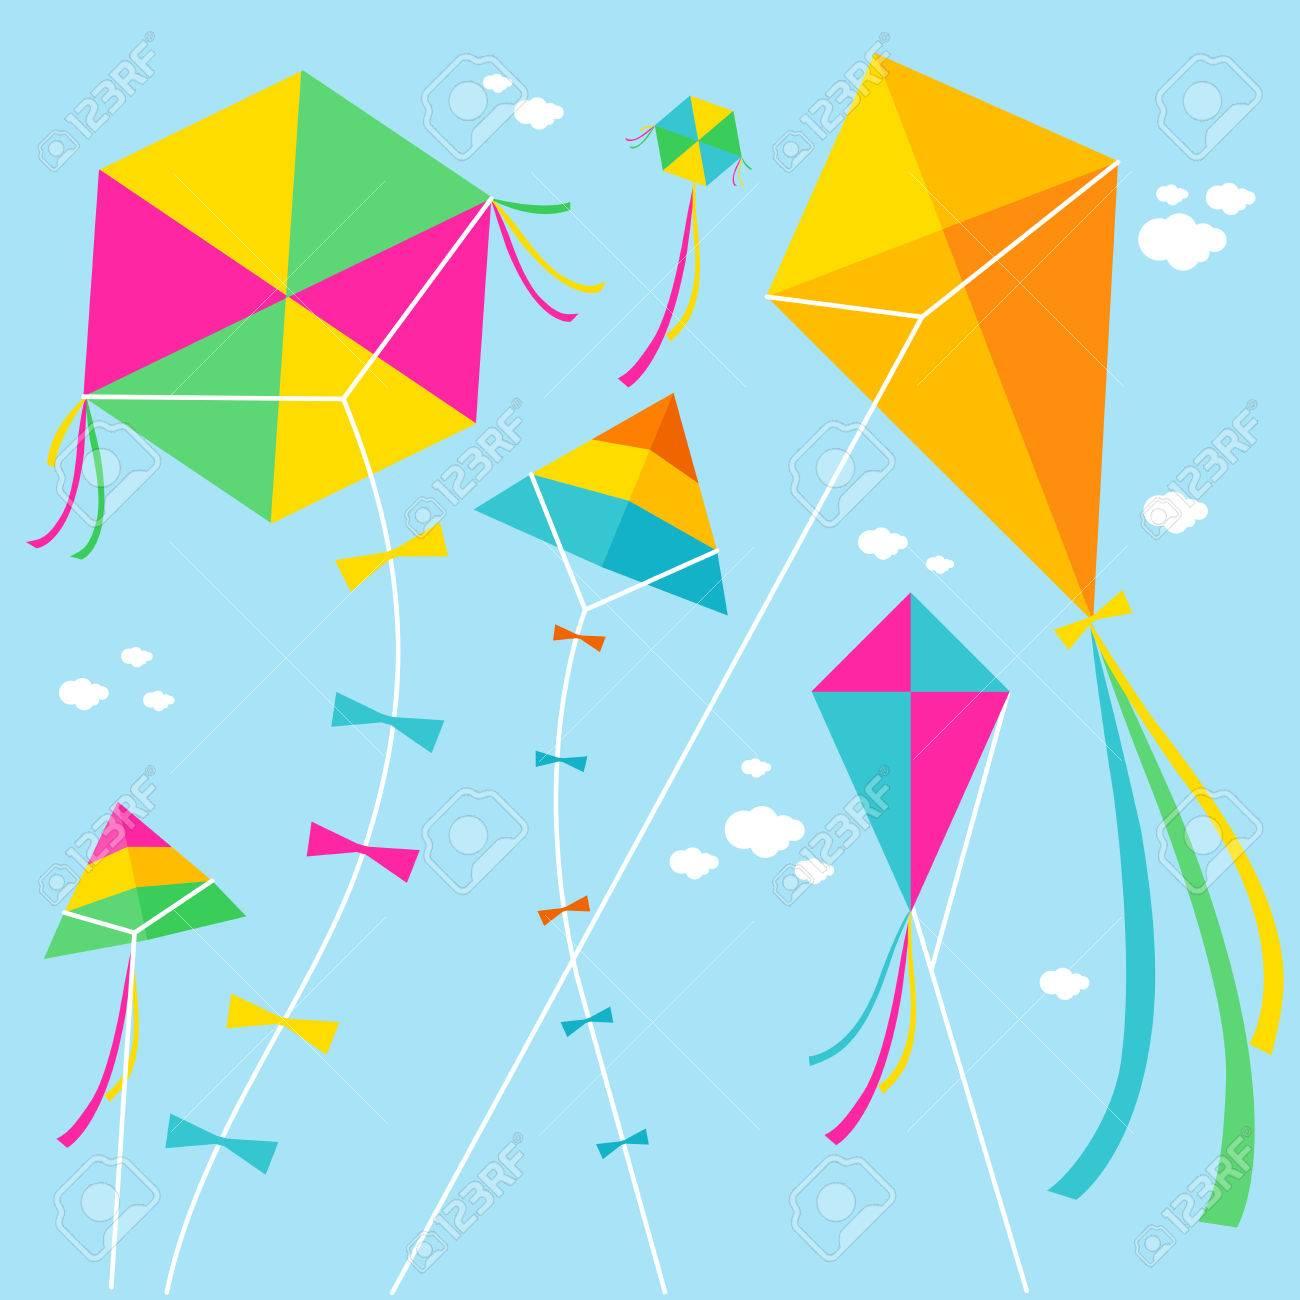 Kites - 50050653